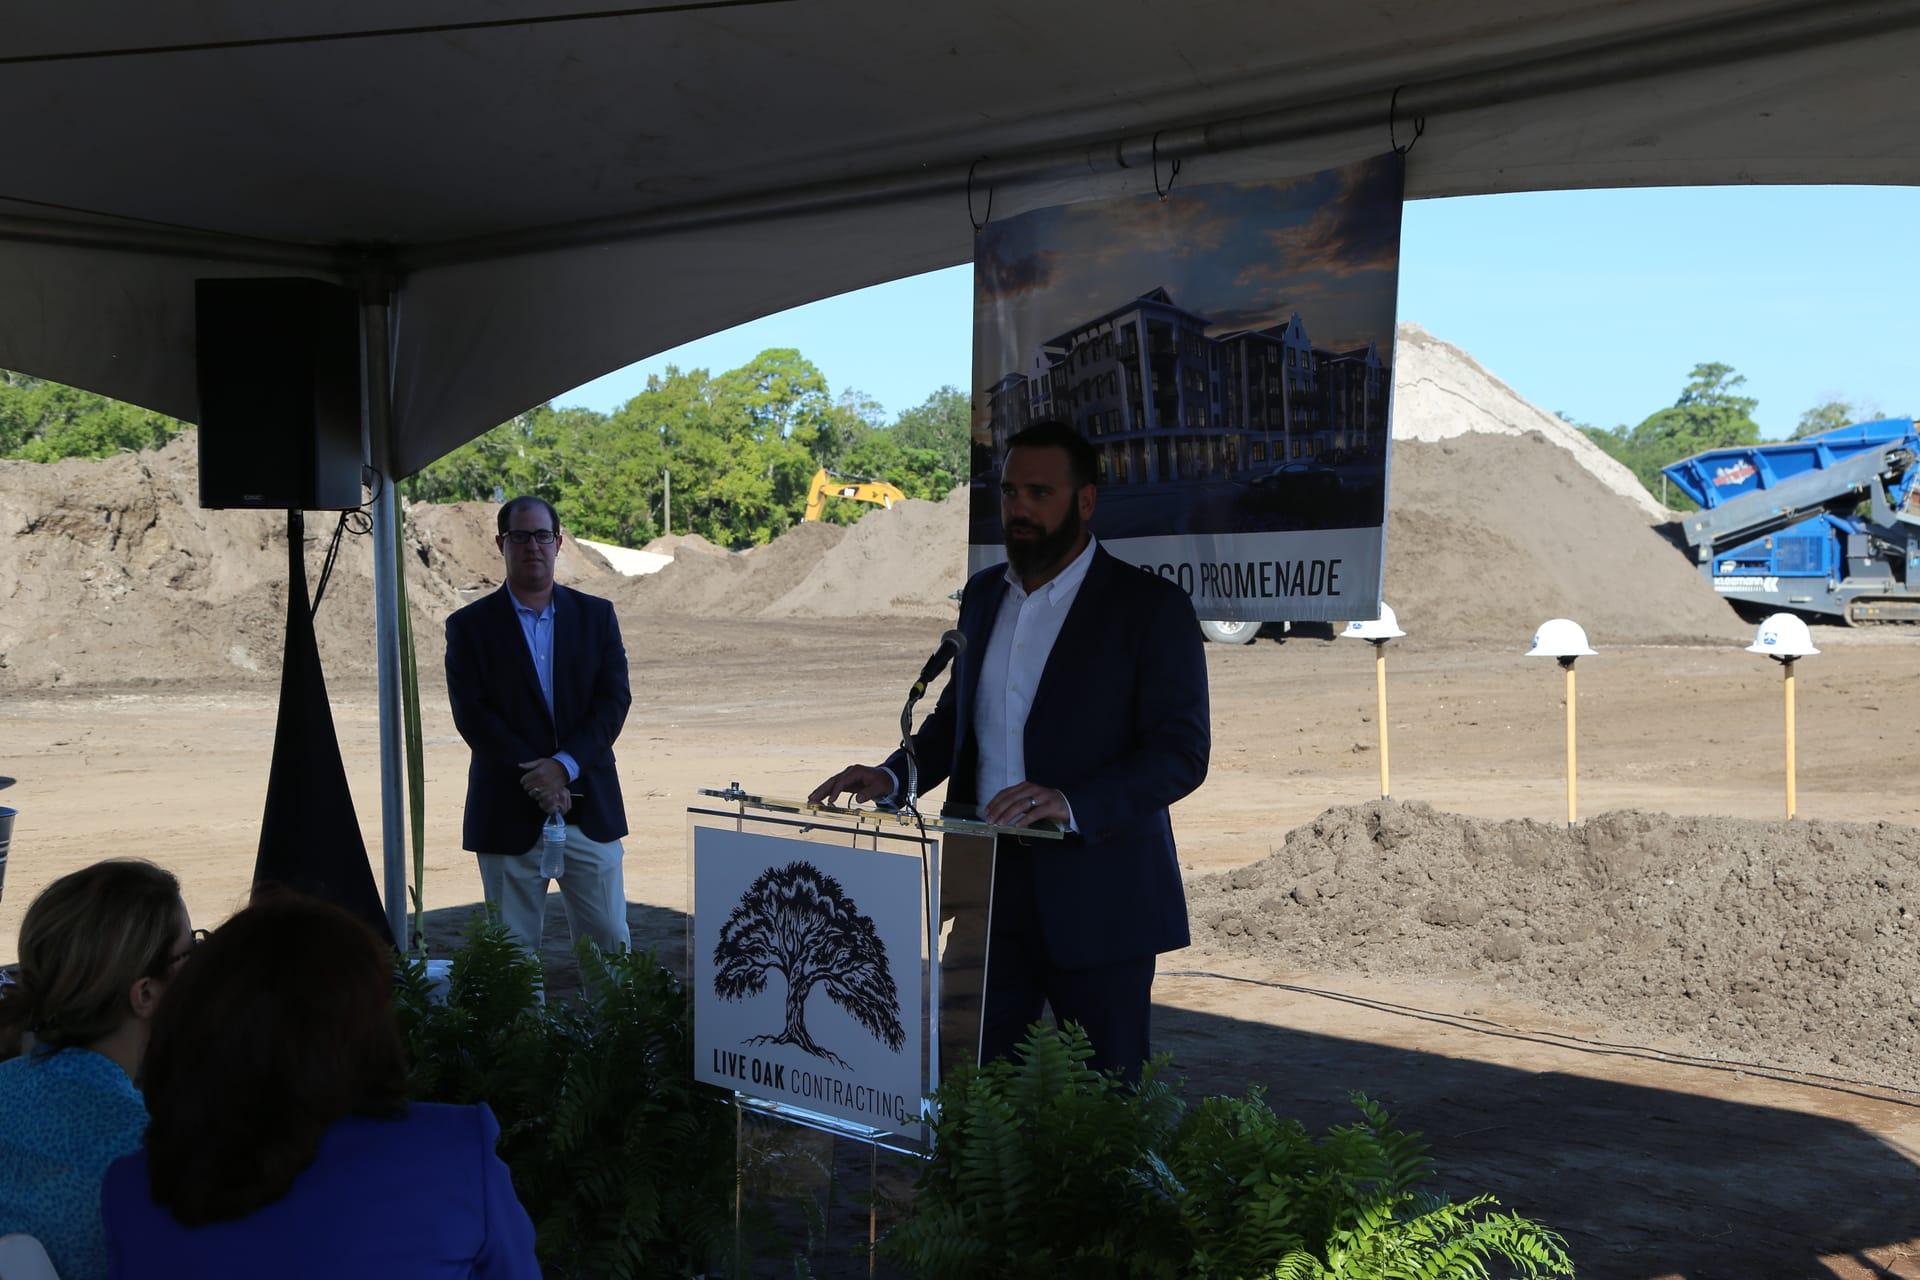 man speaking at podium at construction site